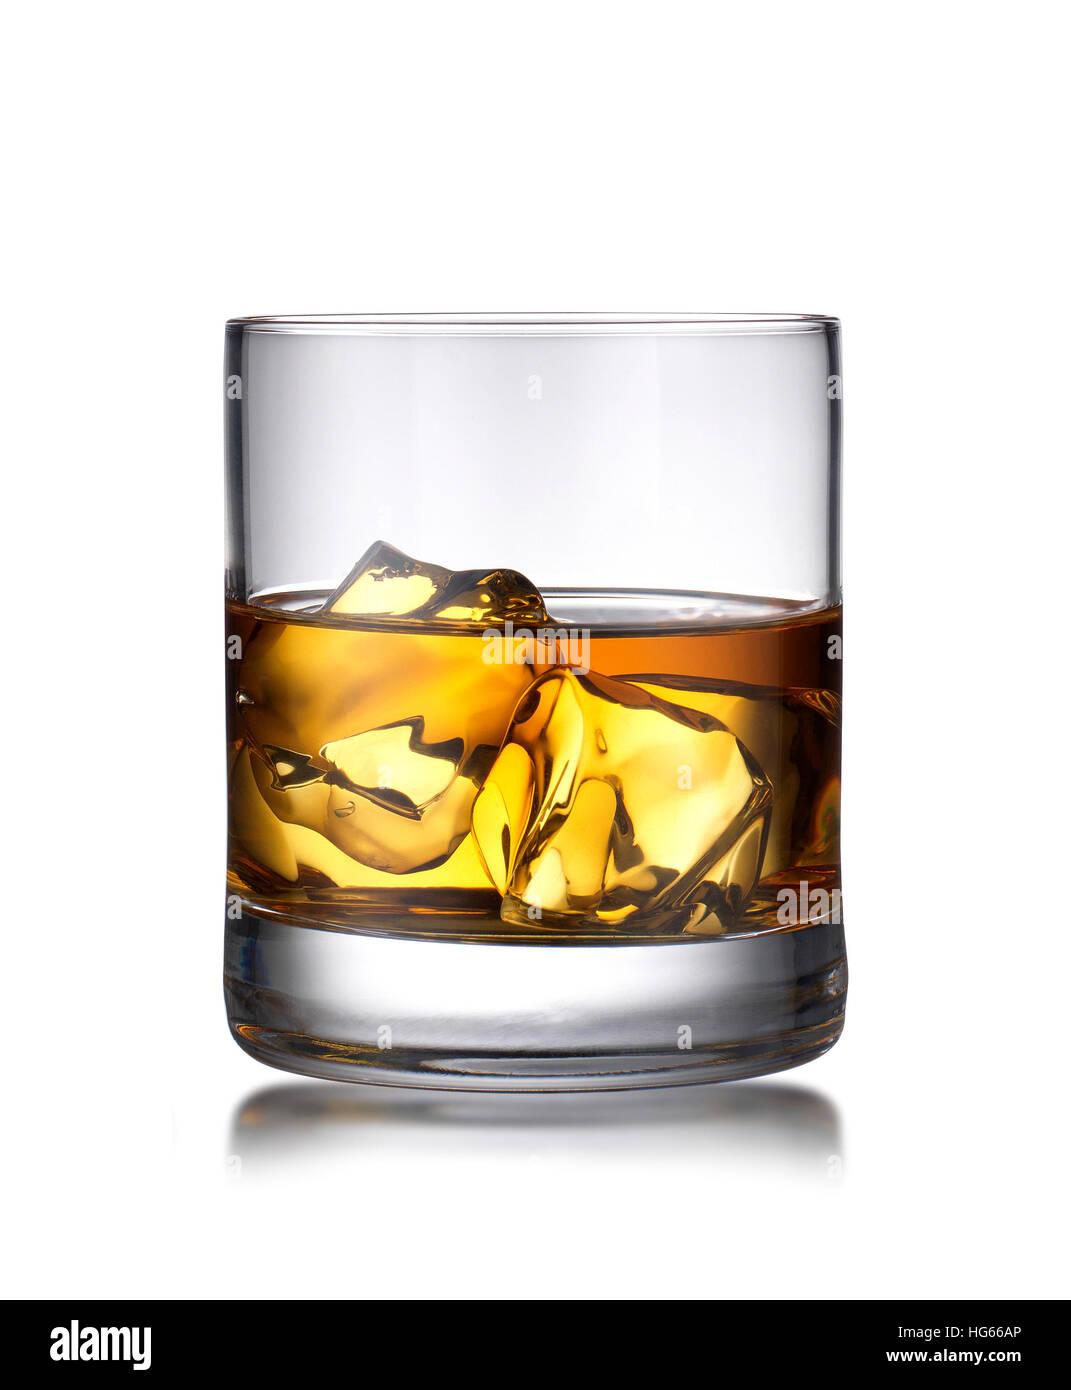 Whiskey tumbler - Stock Image